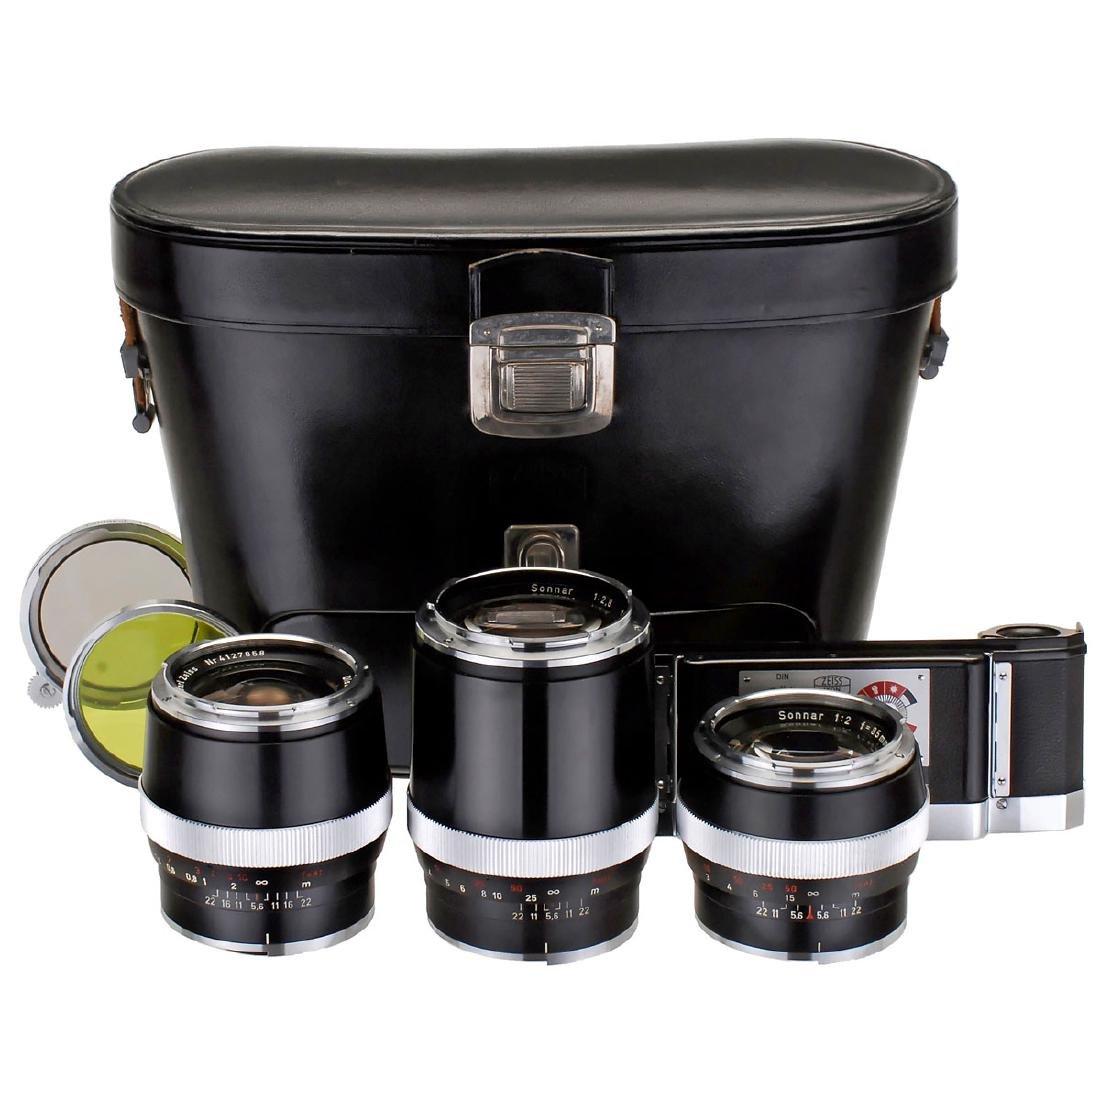 Lens Set for Contarex, c. 1970